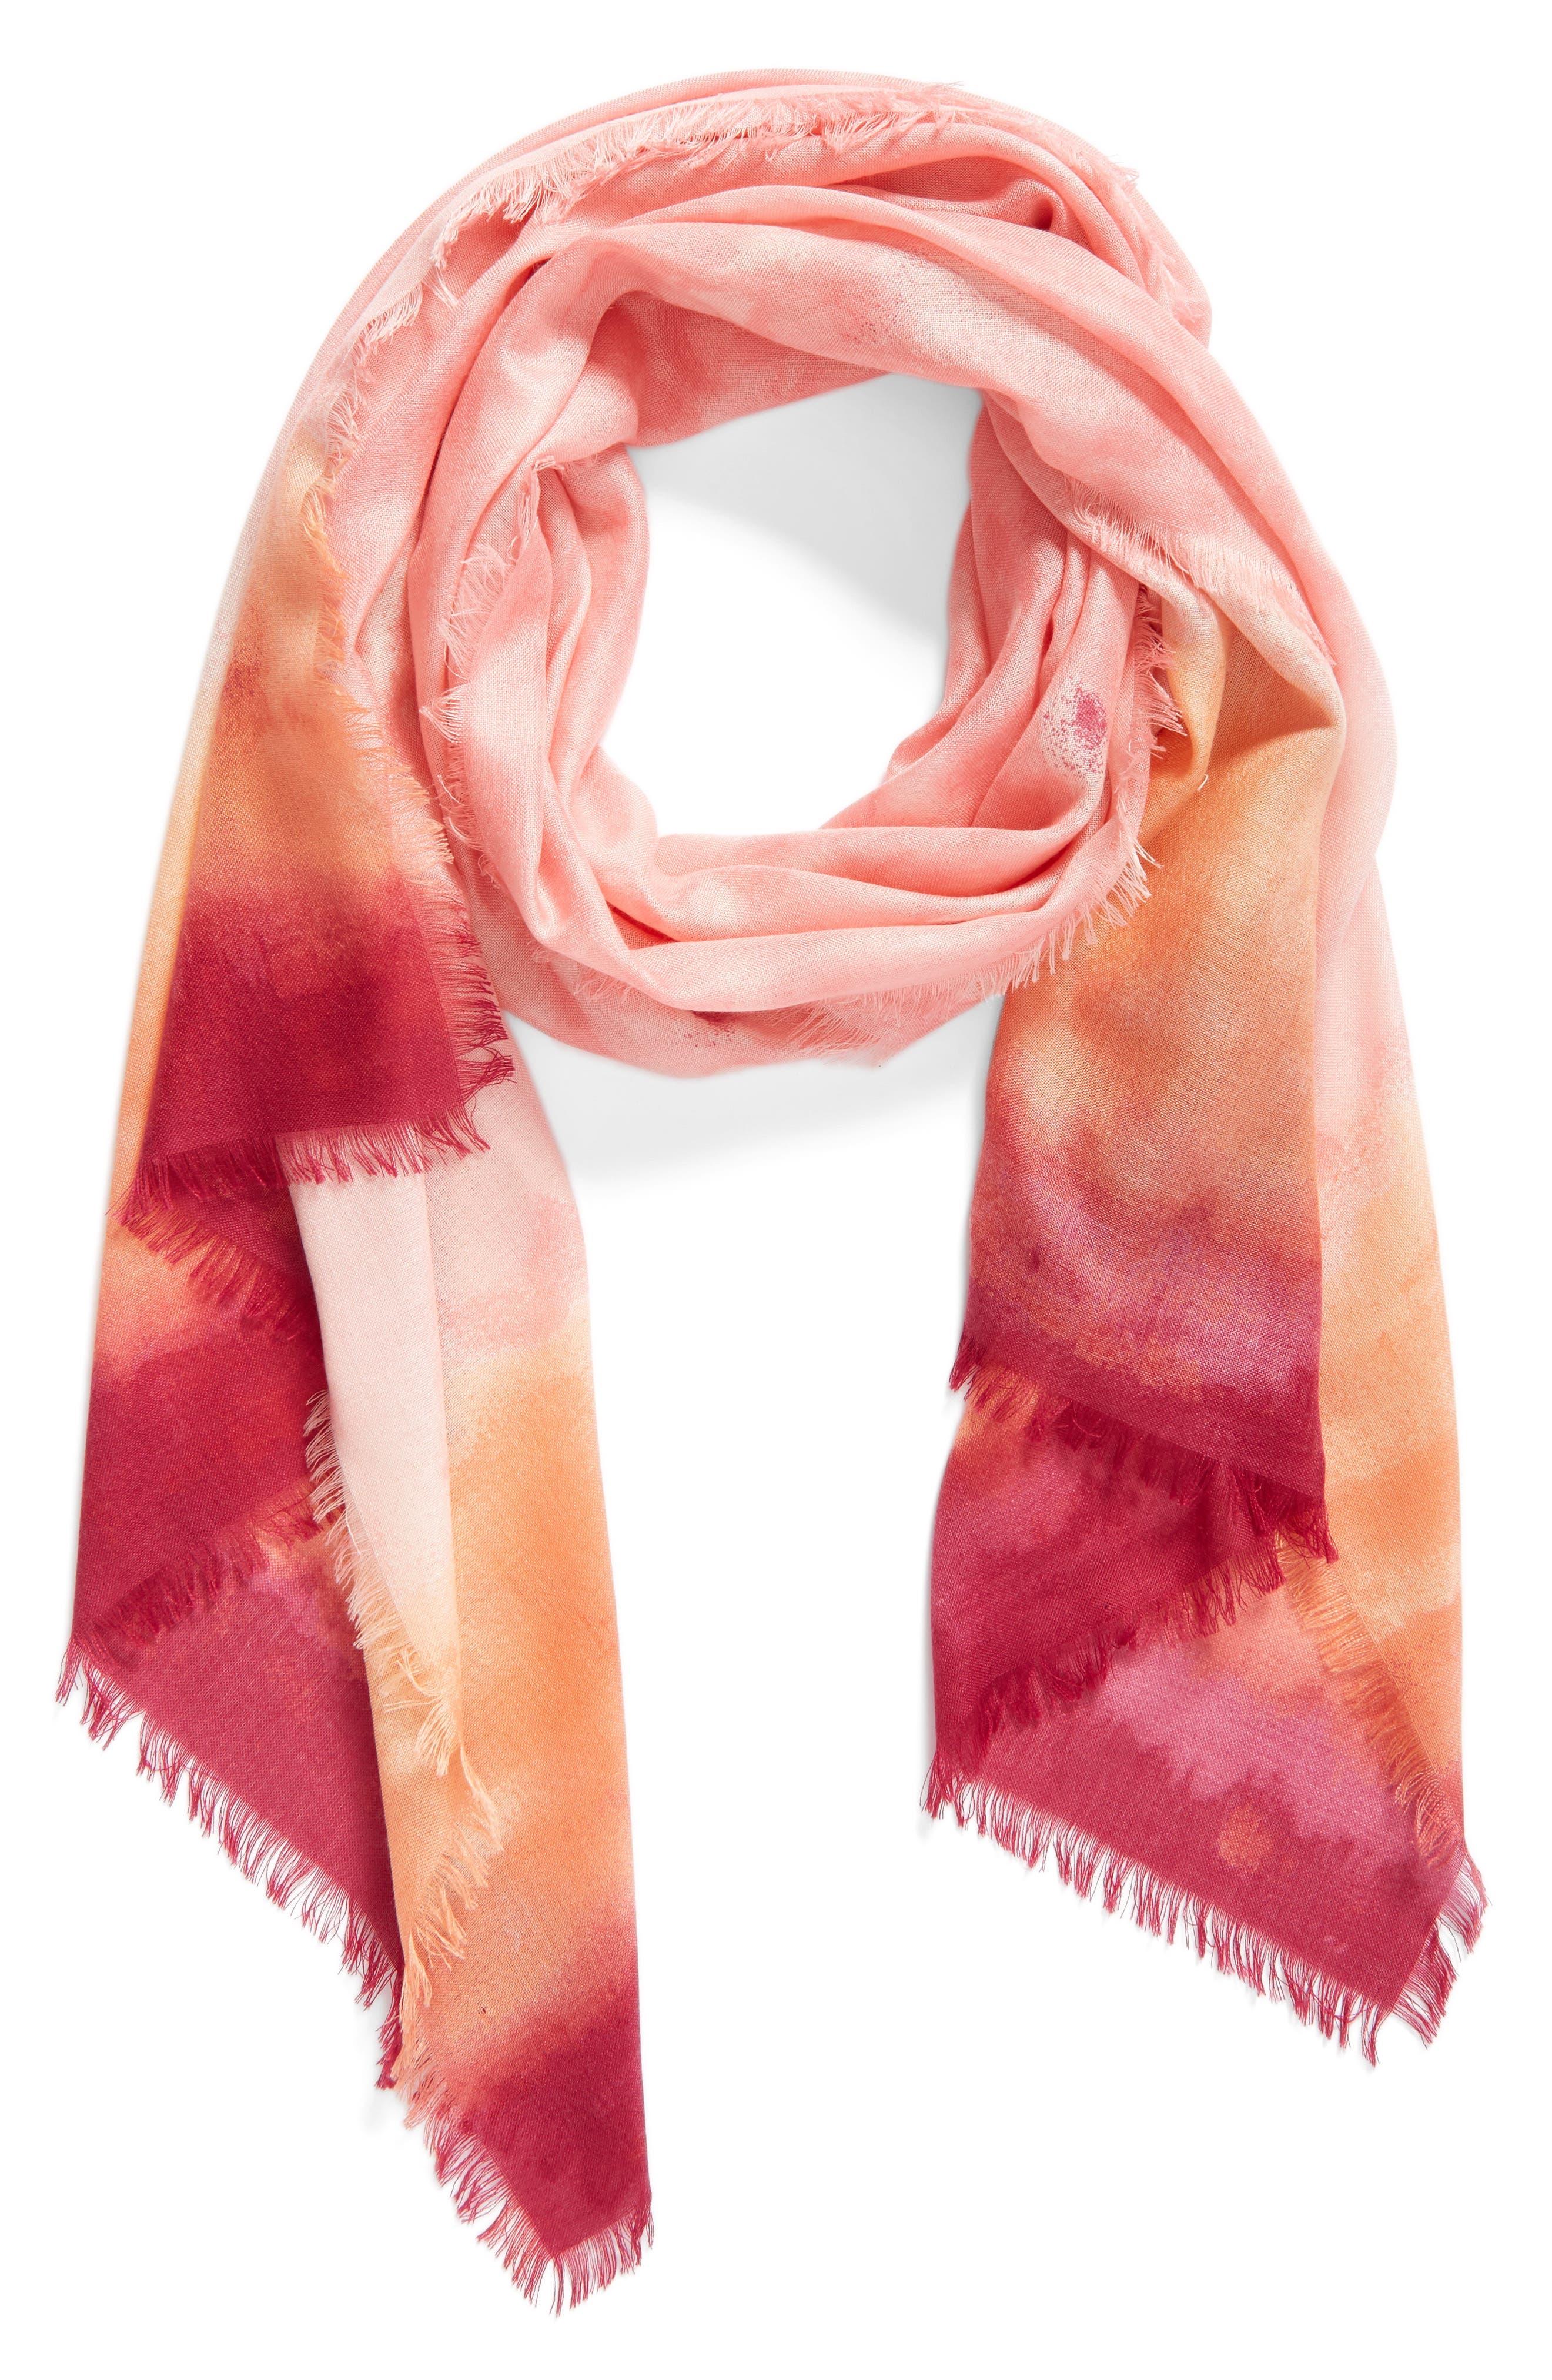 Main Image - Nordstrom Saharan Colorwash Cashmere & Silk Scarf